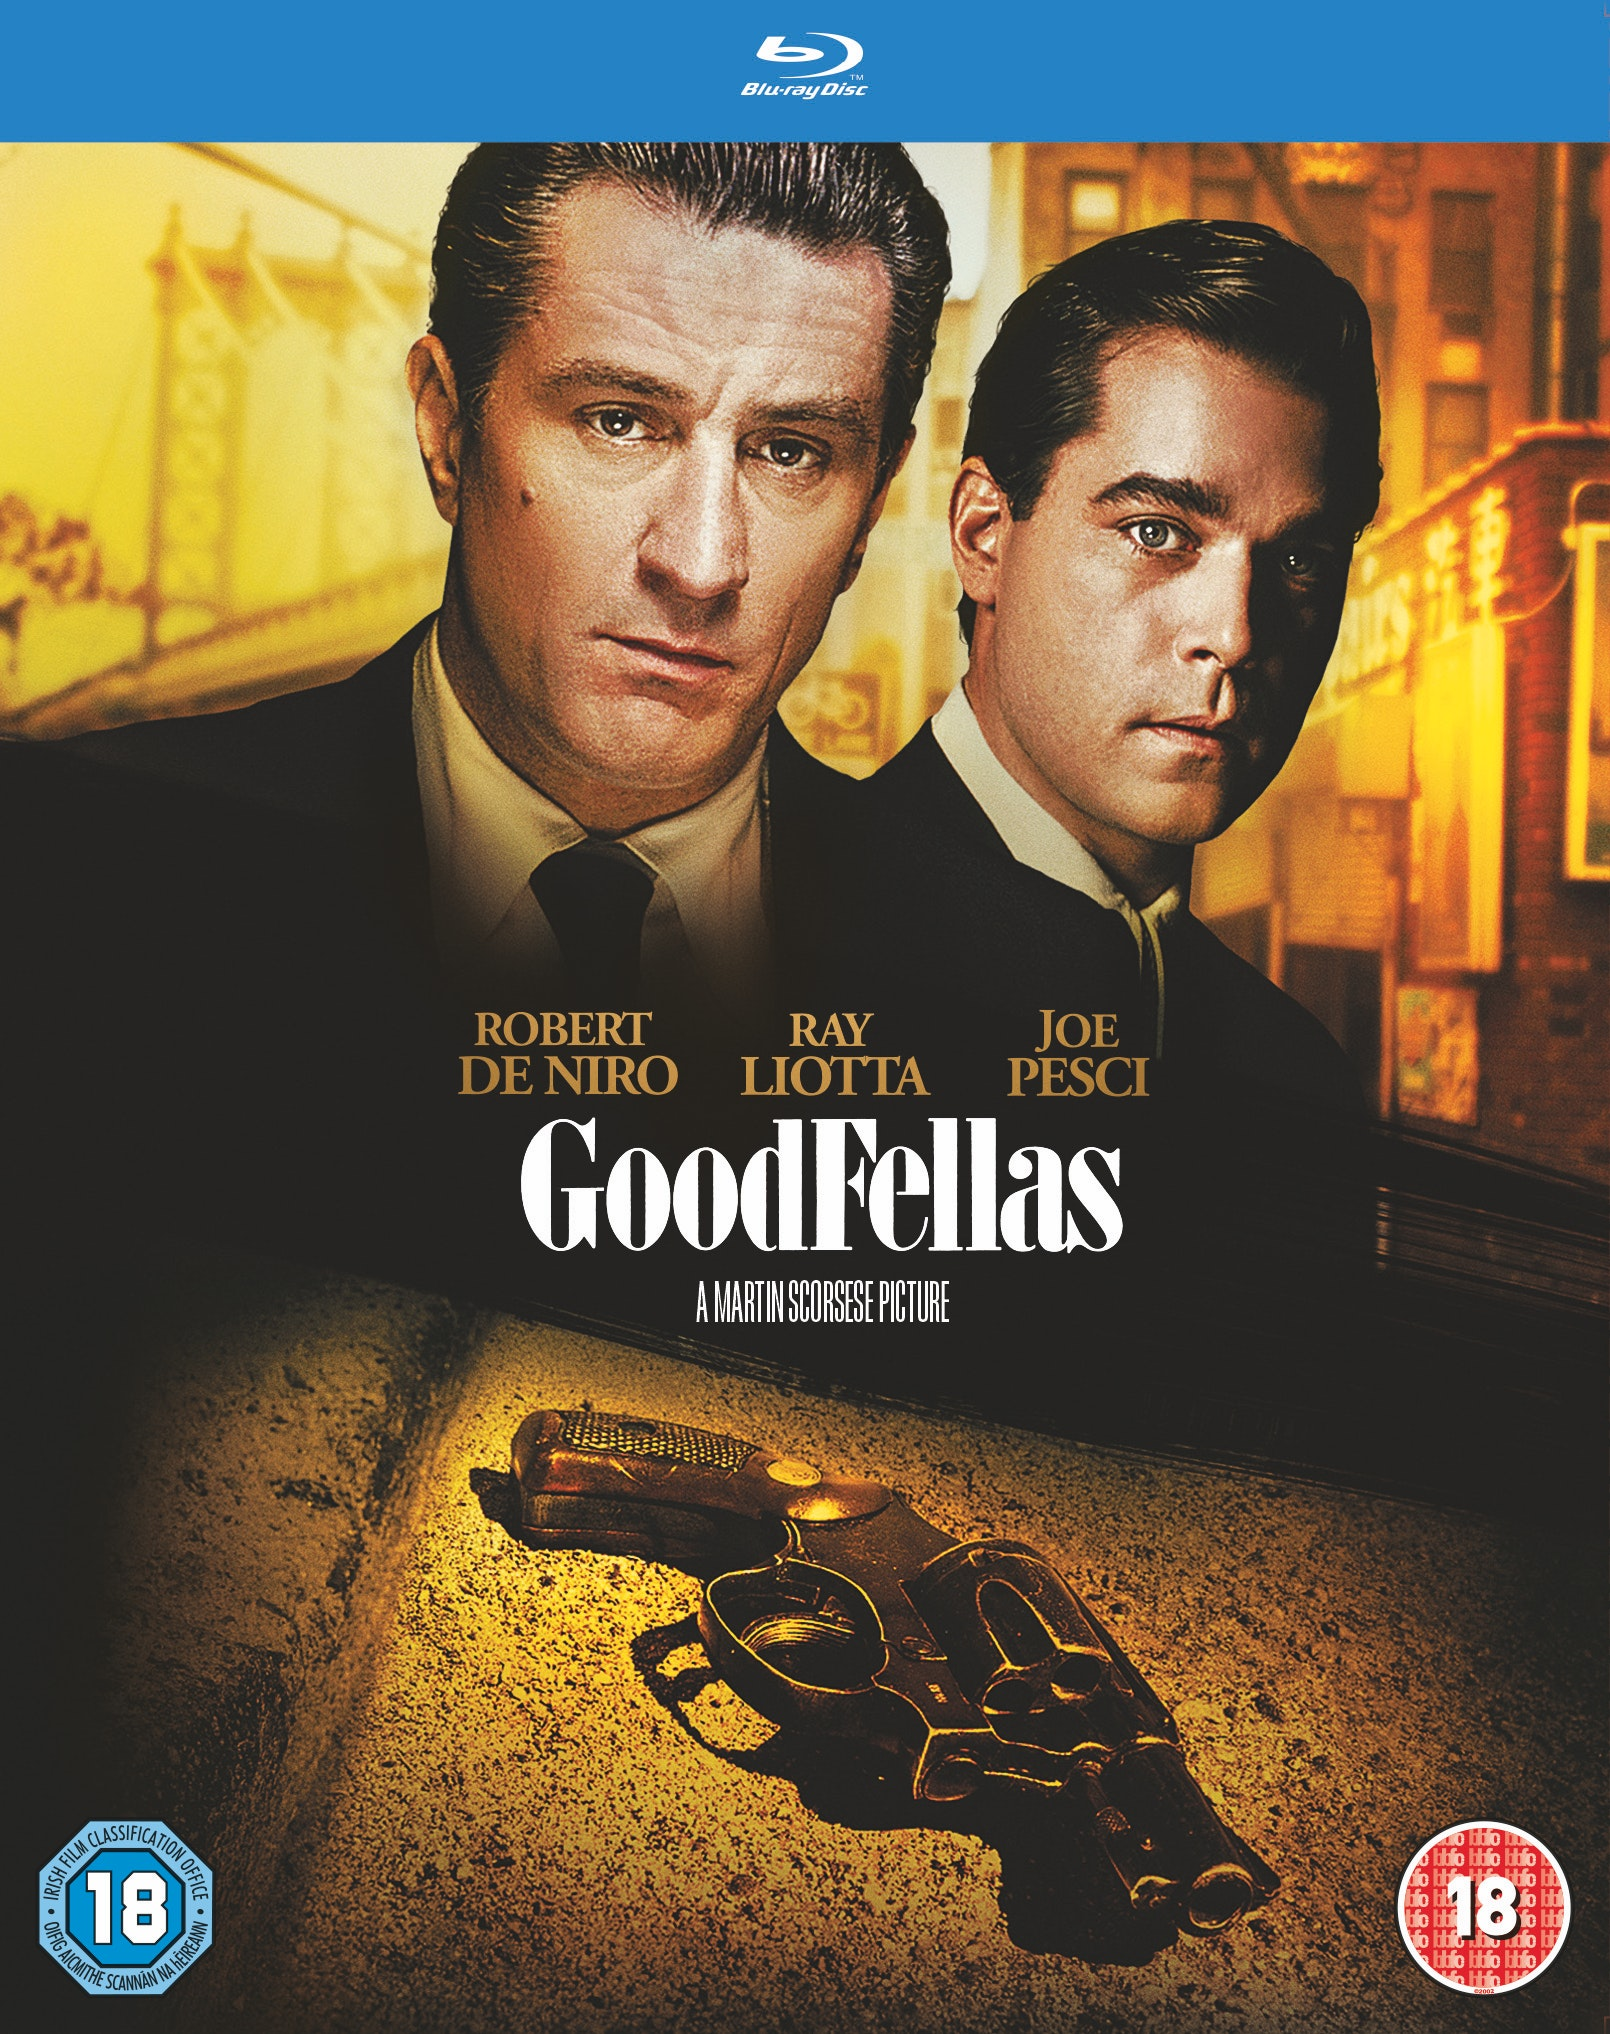 Goodfellas Blu-ray sweepstakes